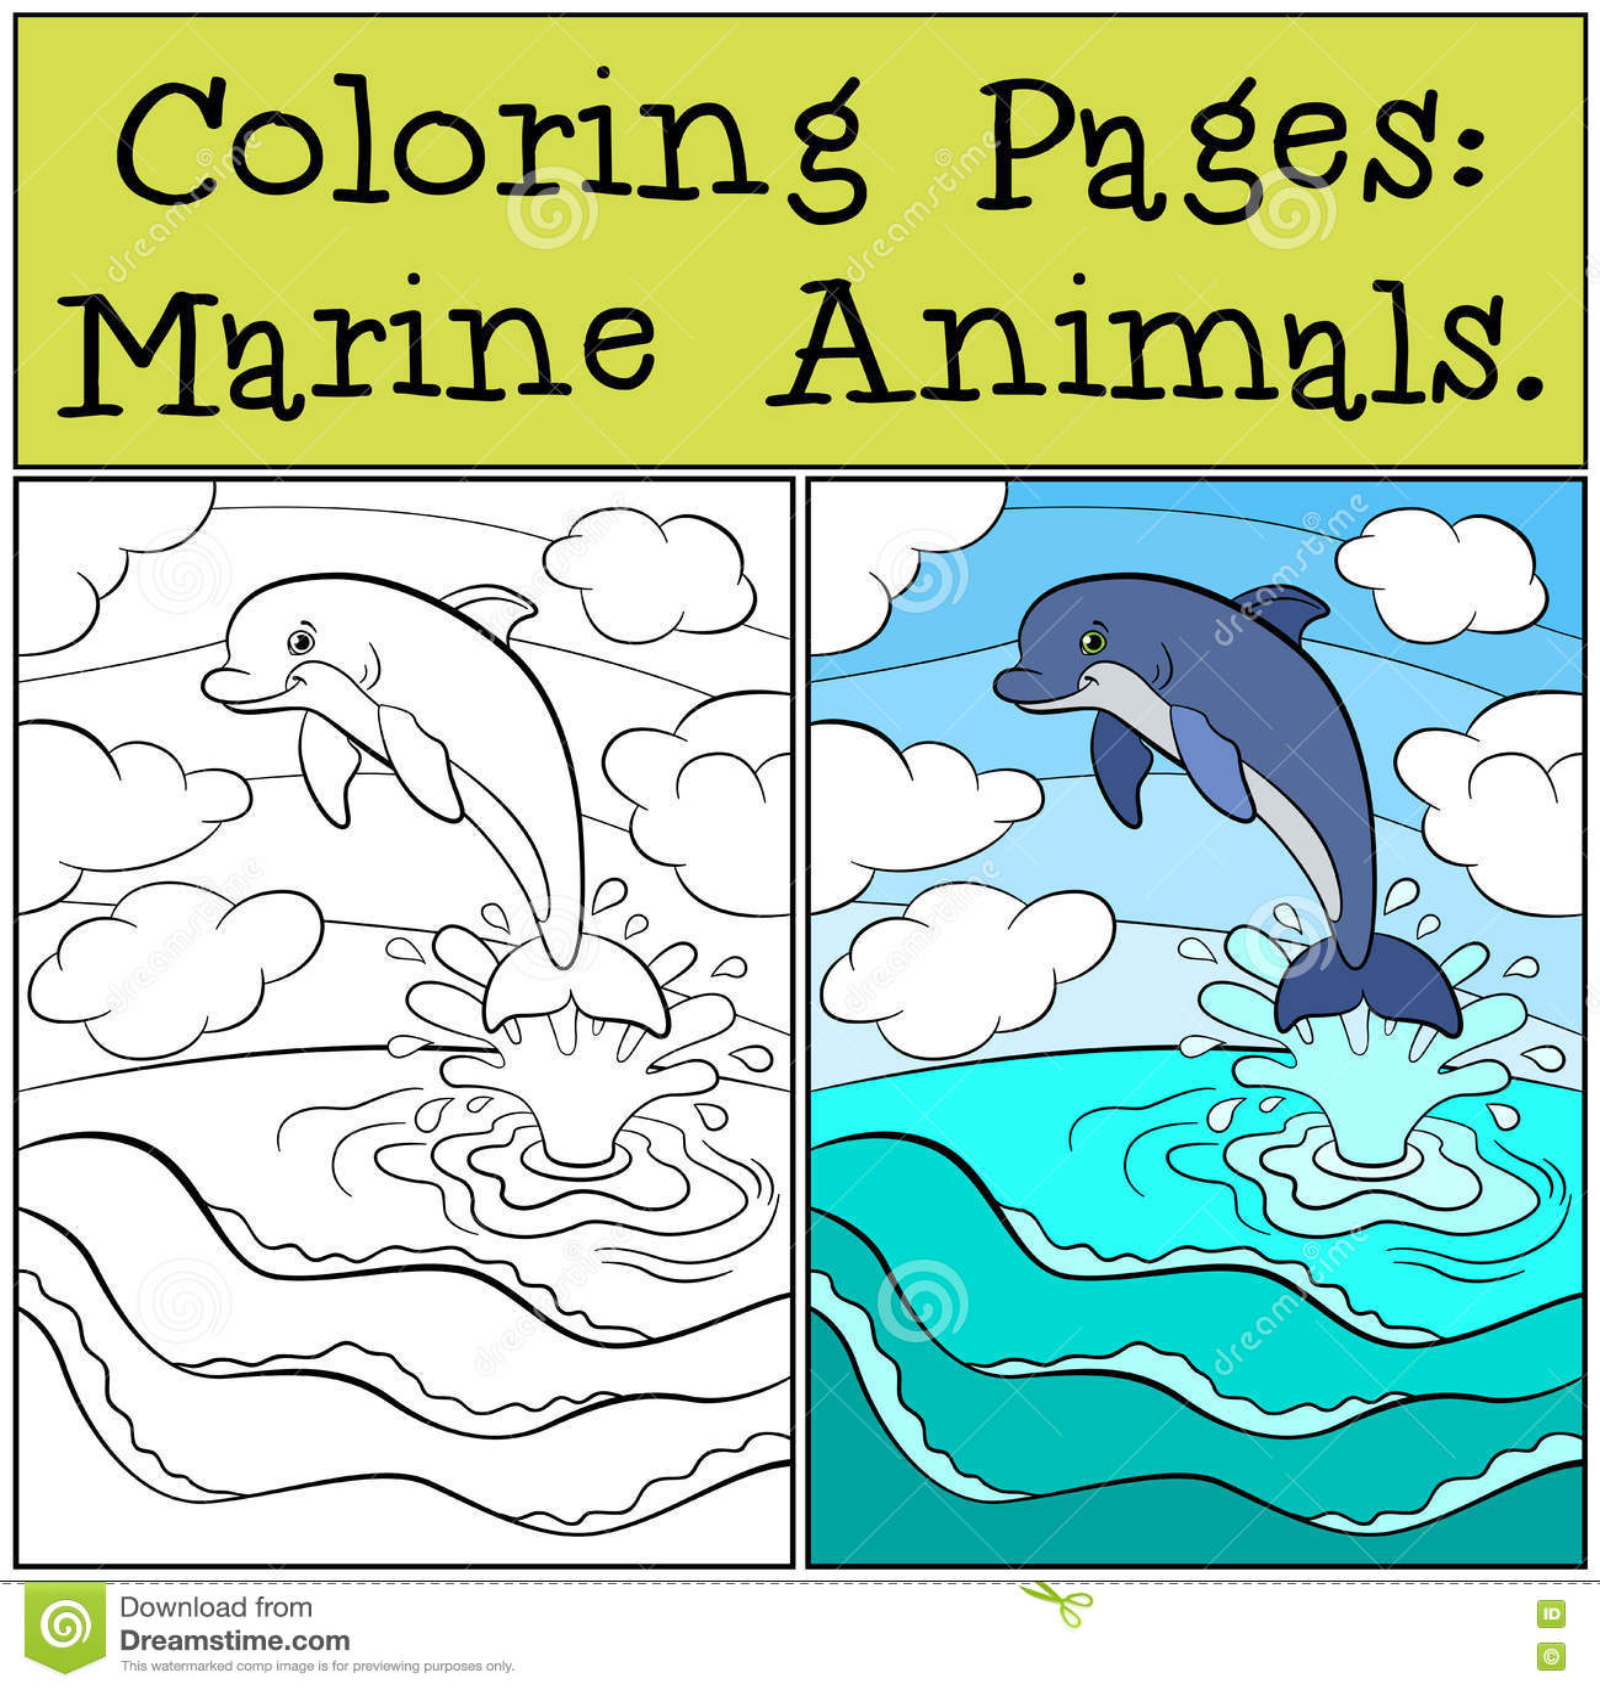 Ocean Coloring Pages - Bestofcoloring.com |Aquatic Animals Coloring Pages